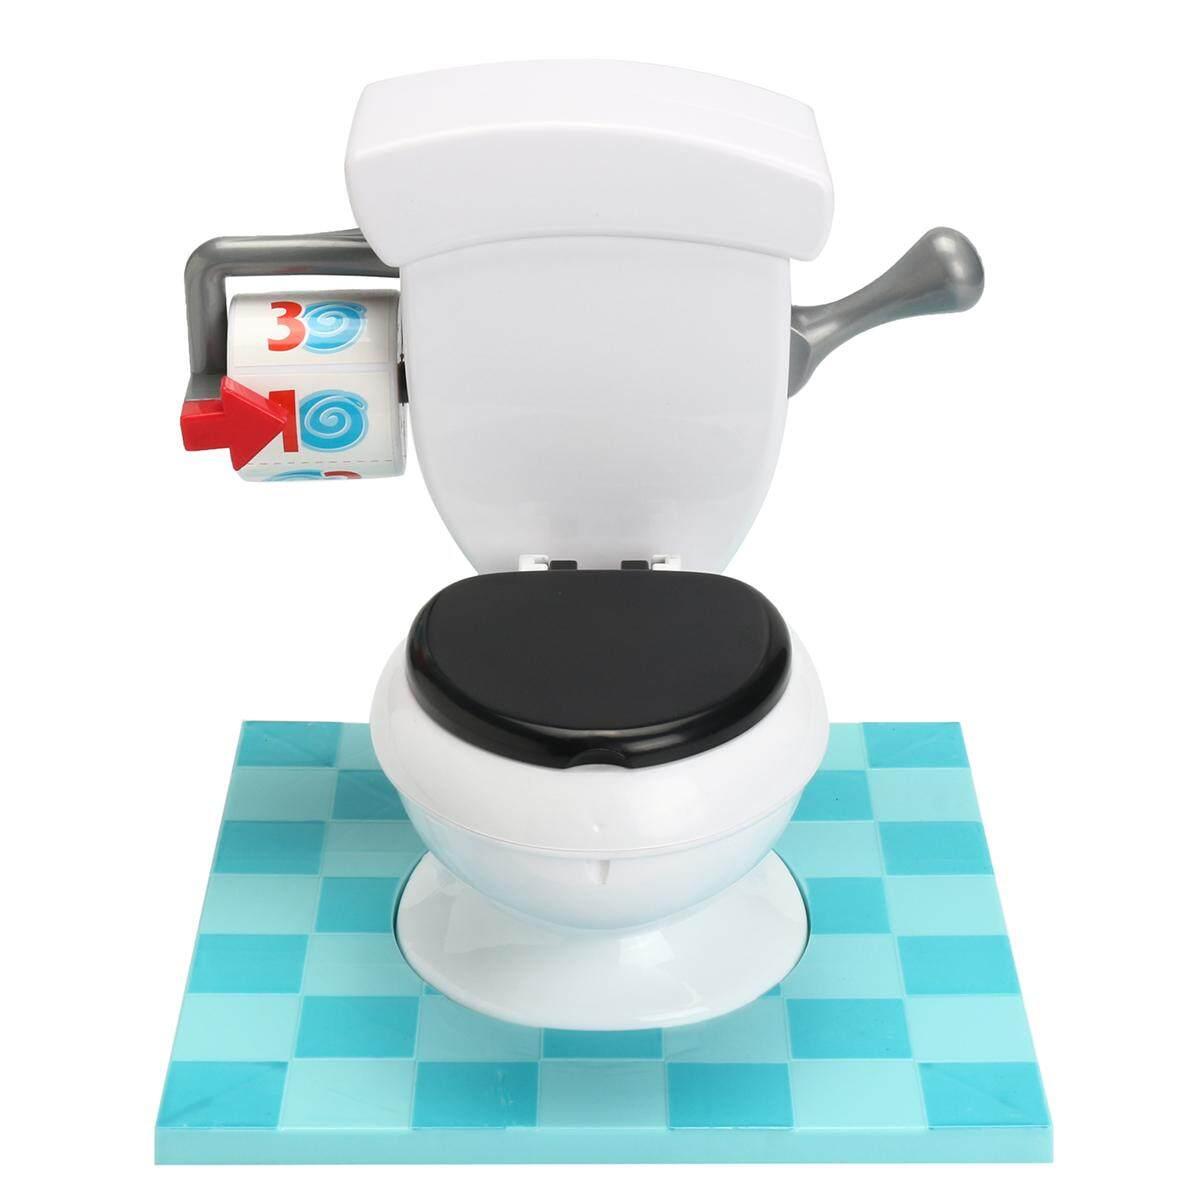 Hình ảnh OZ Toilet Trouble Hilarious Board Game Flush Sound Effects Kids Children Fun Toy - intl